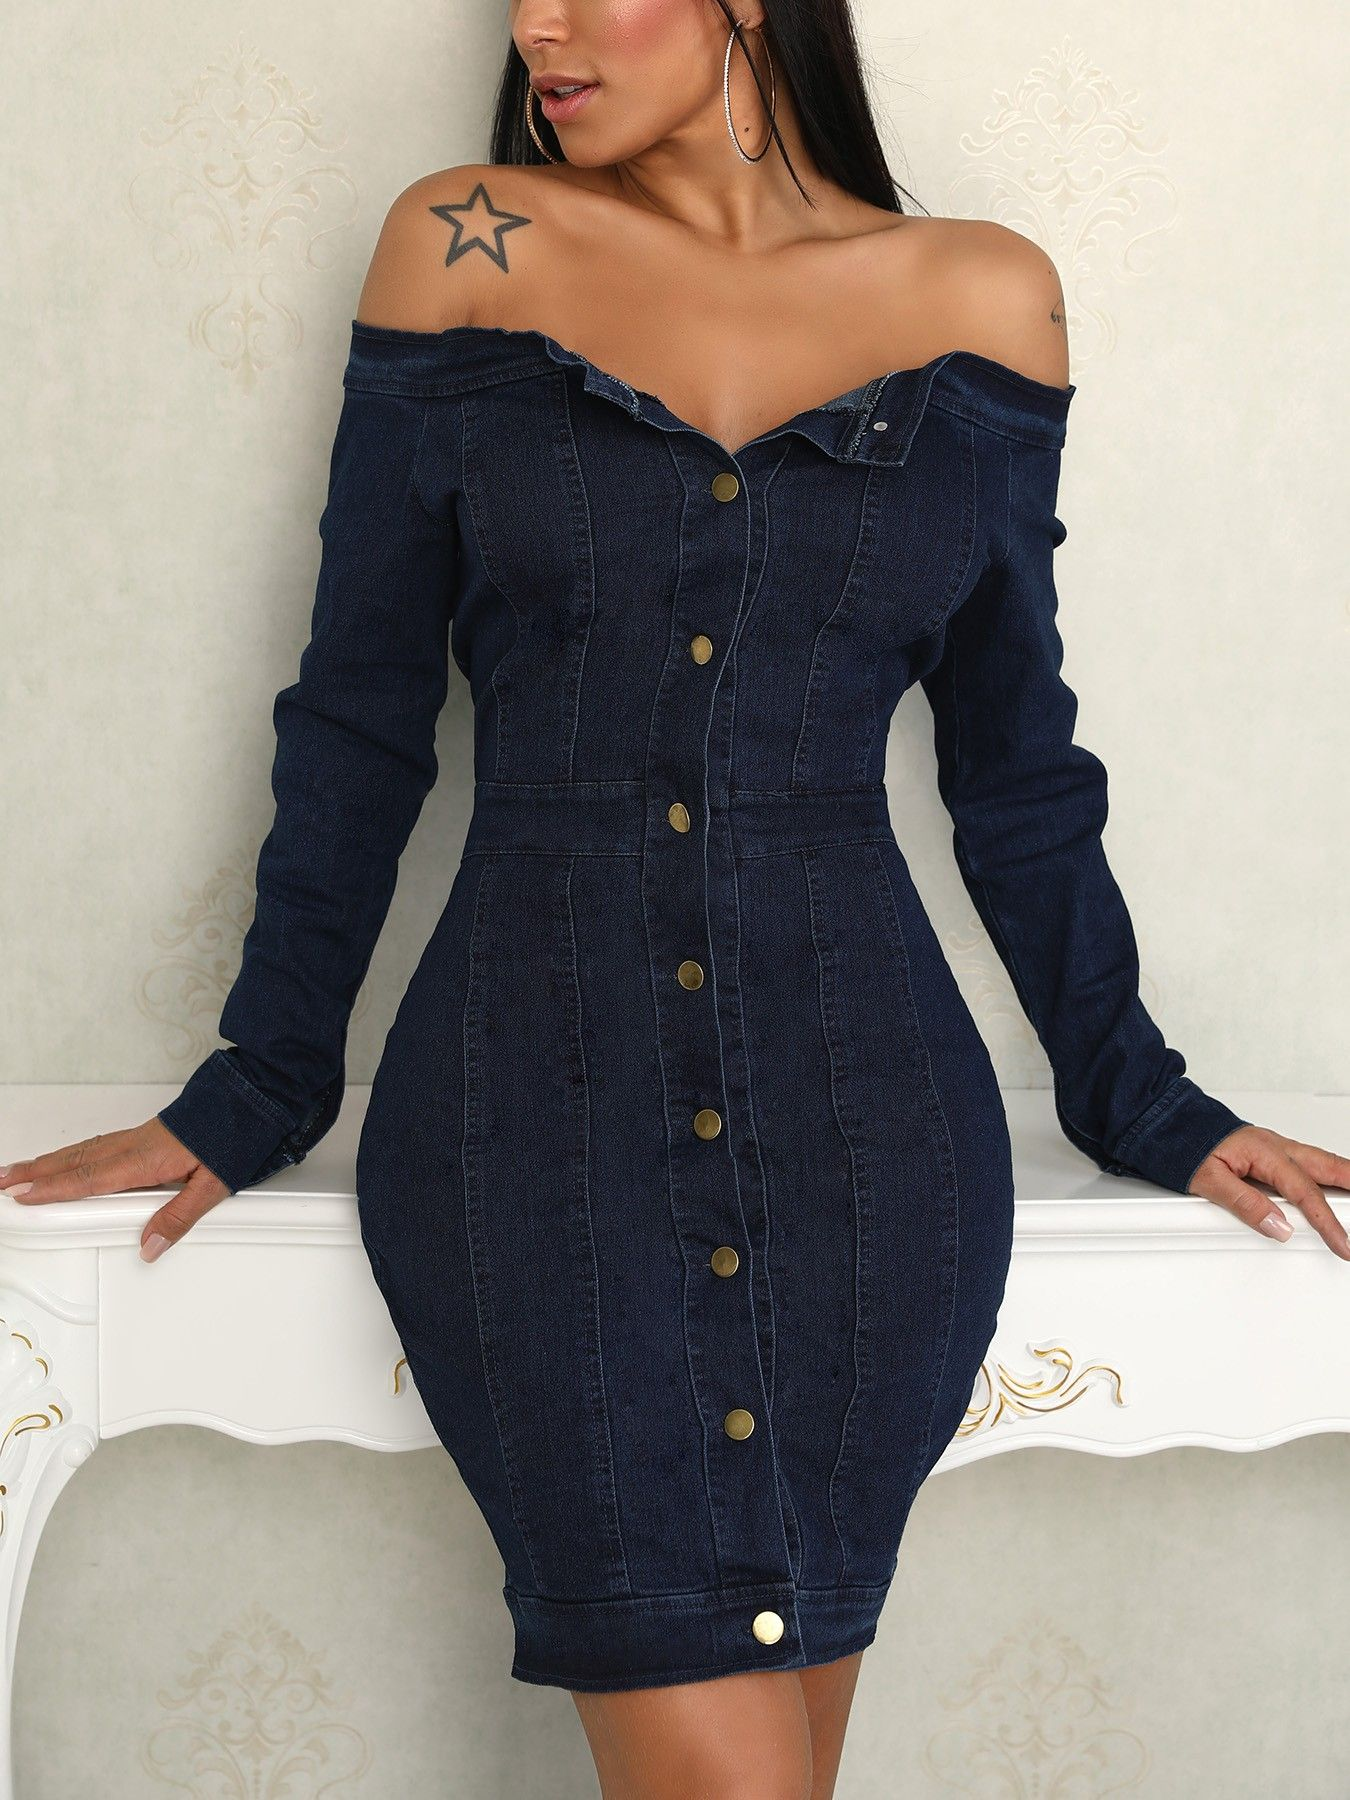 Button Up Off Shoulder Denim Bodycon Dress Bodycon Dress Shop Bodycon Dresses Fashion Dresses Online [ 1800 x 1350 Pixel ]